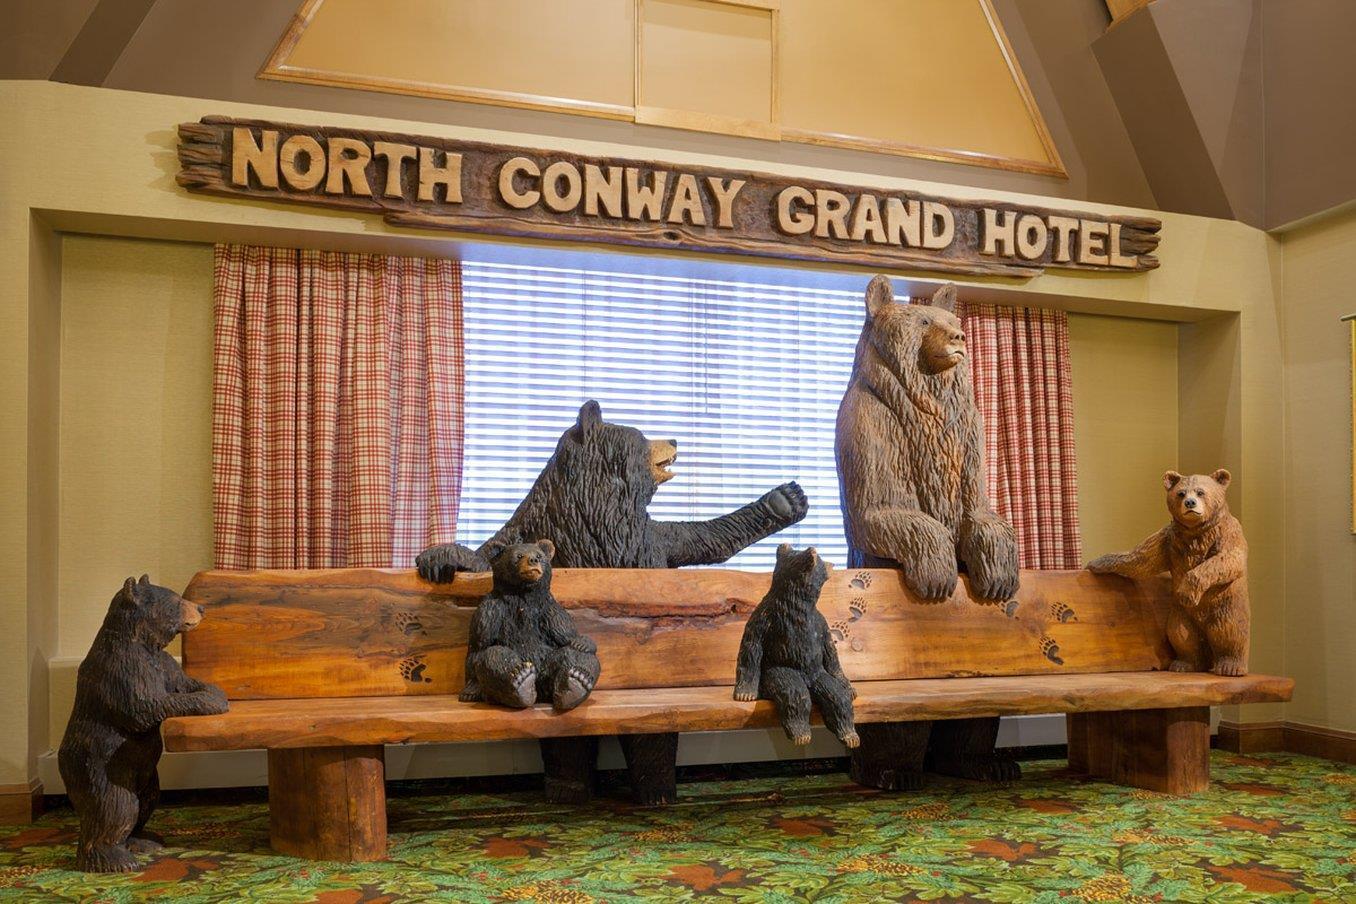 Lobby - Grand Hotel North Conway